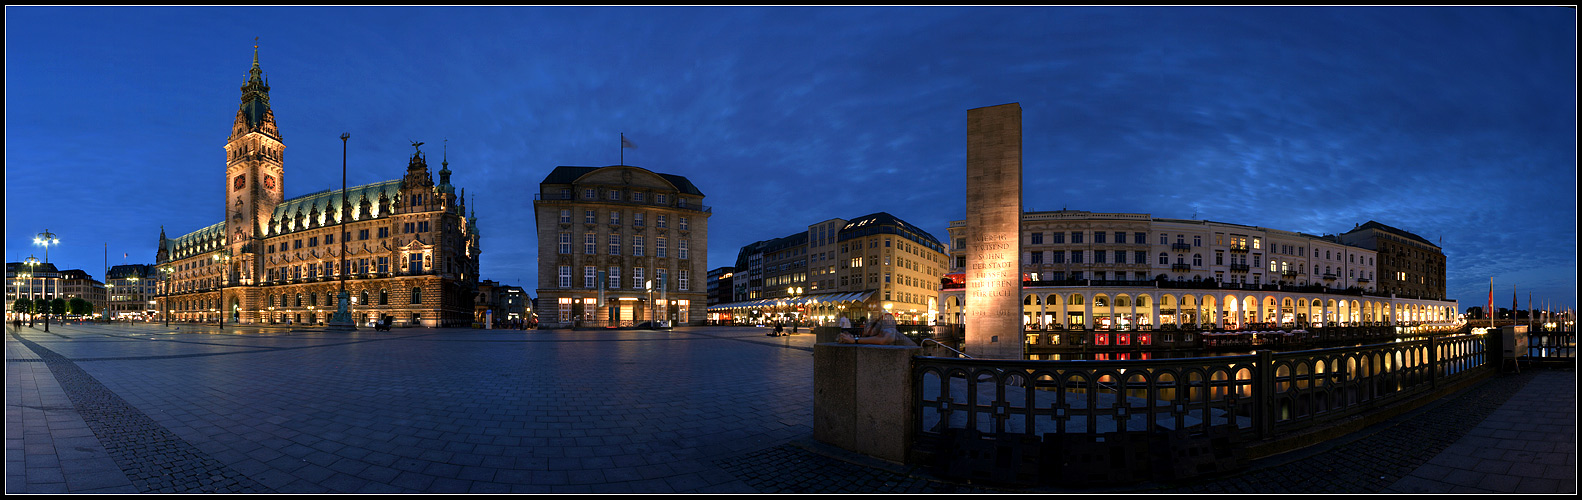 Rathaus-Pano Reload